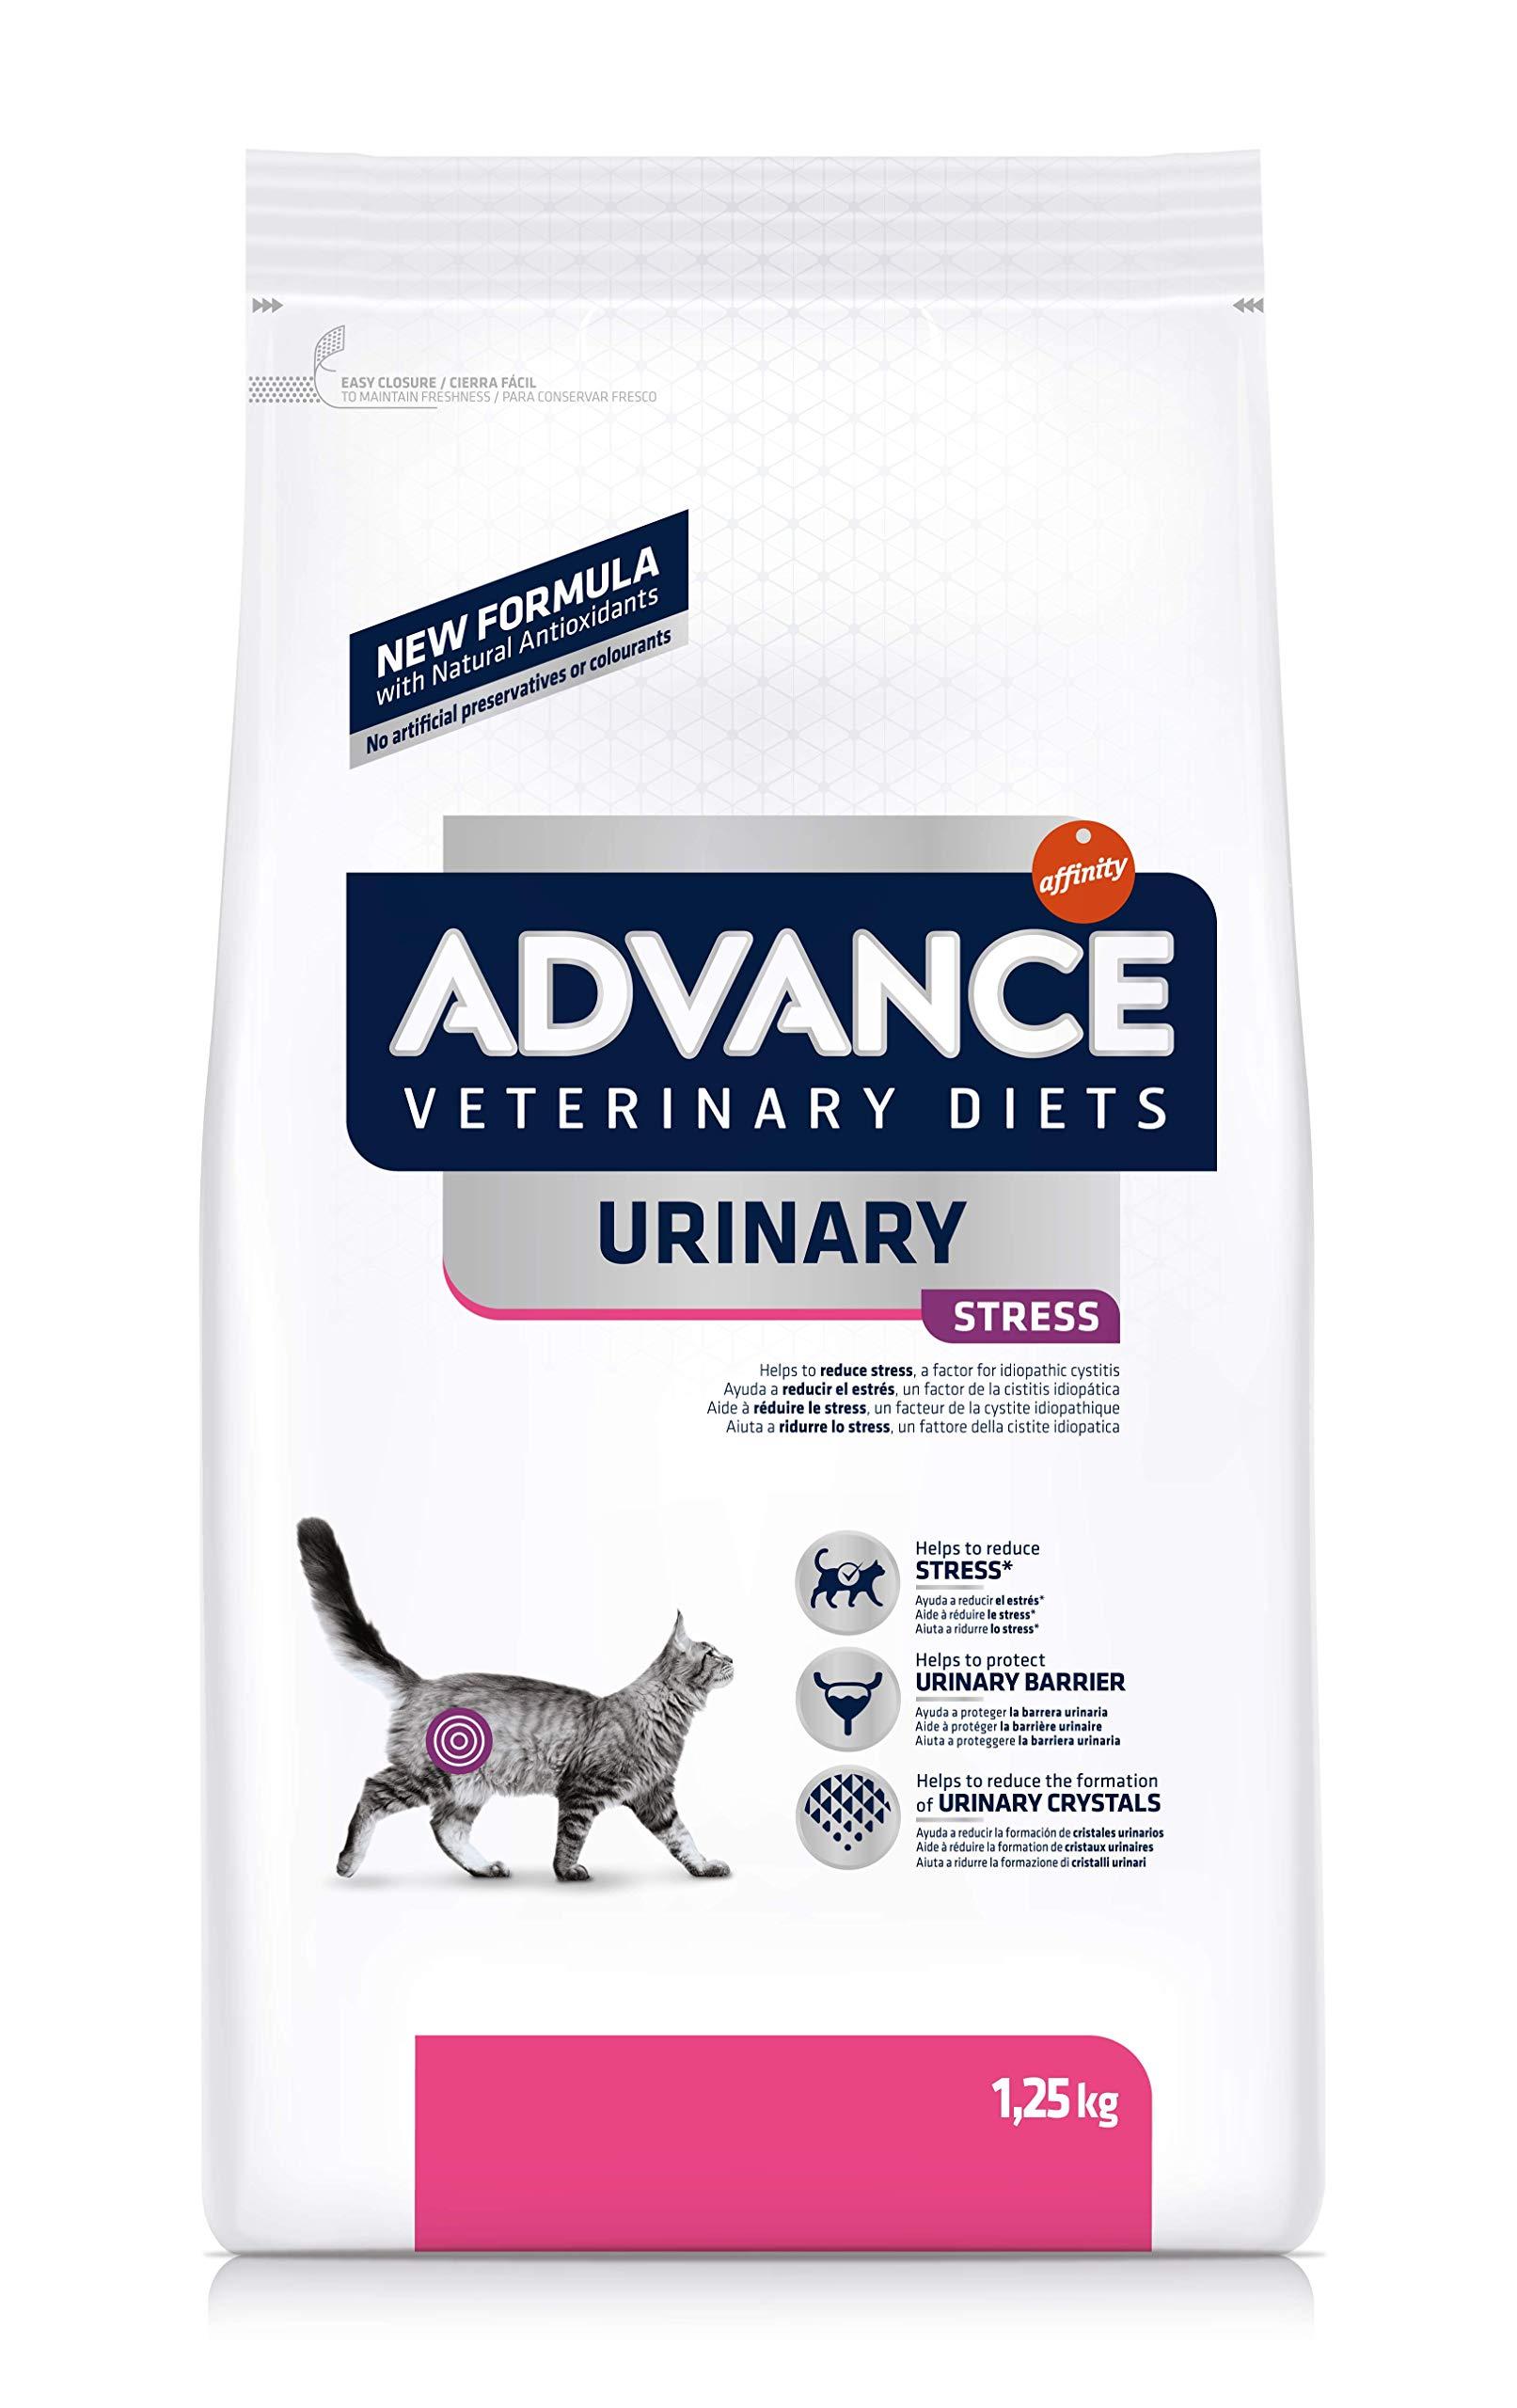 Advance Veterinary Diets Urinary Stress - Pienso para Gatos,1.25 kg: Amazon.es: Productos para mascotas